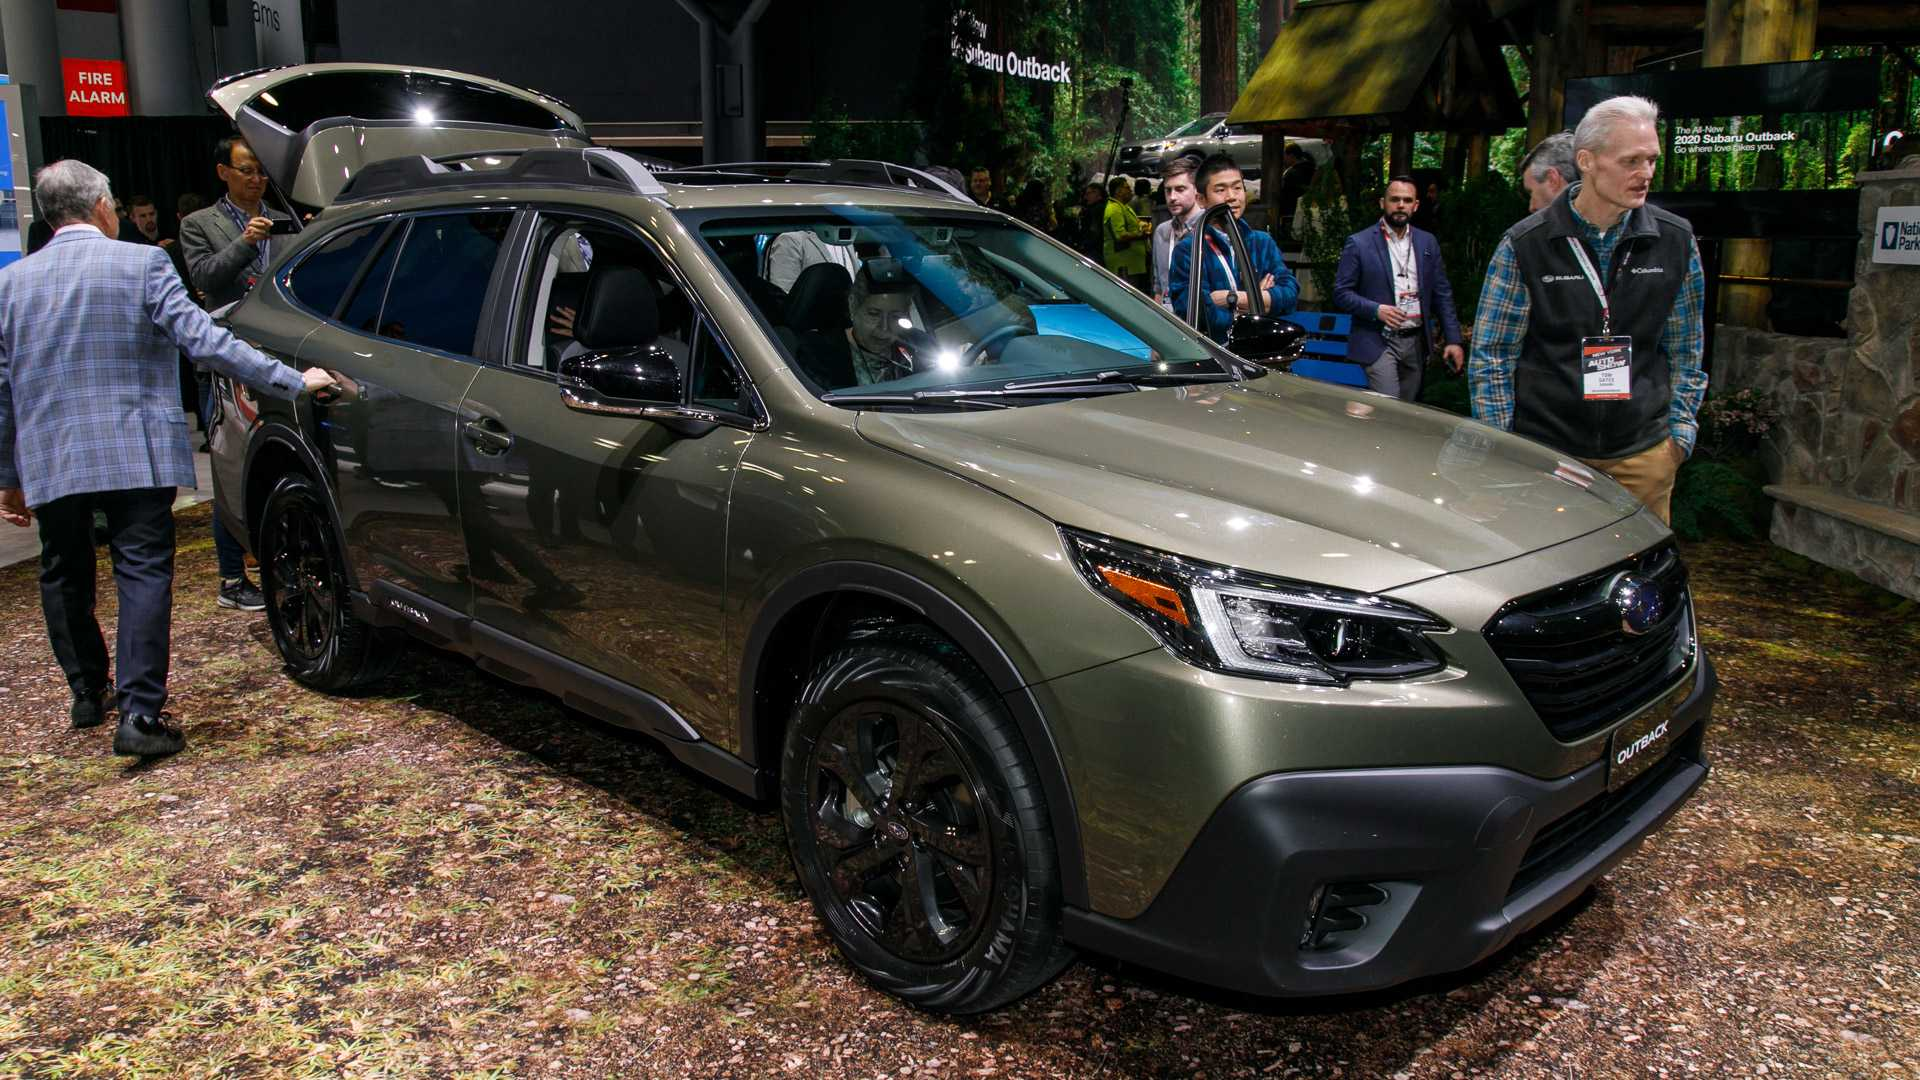 Ny Auto Show 2020.2020 Outback Unveiled At Ny Auto Show Subaru Car Forums